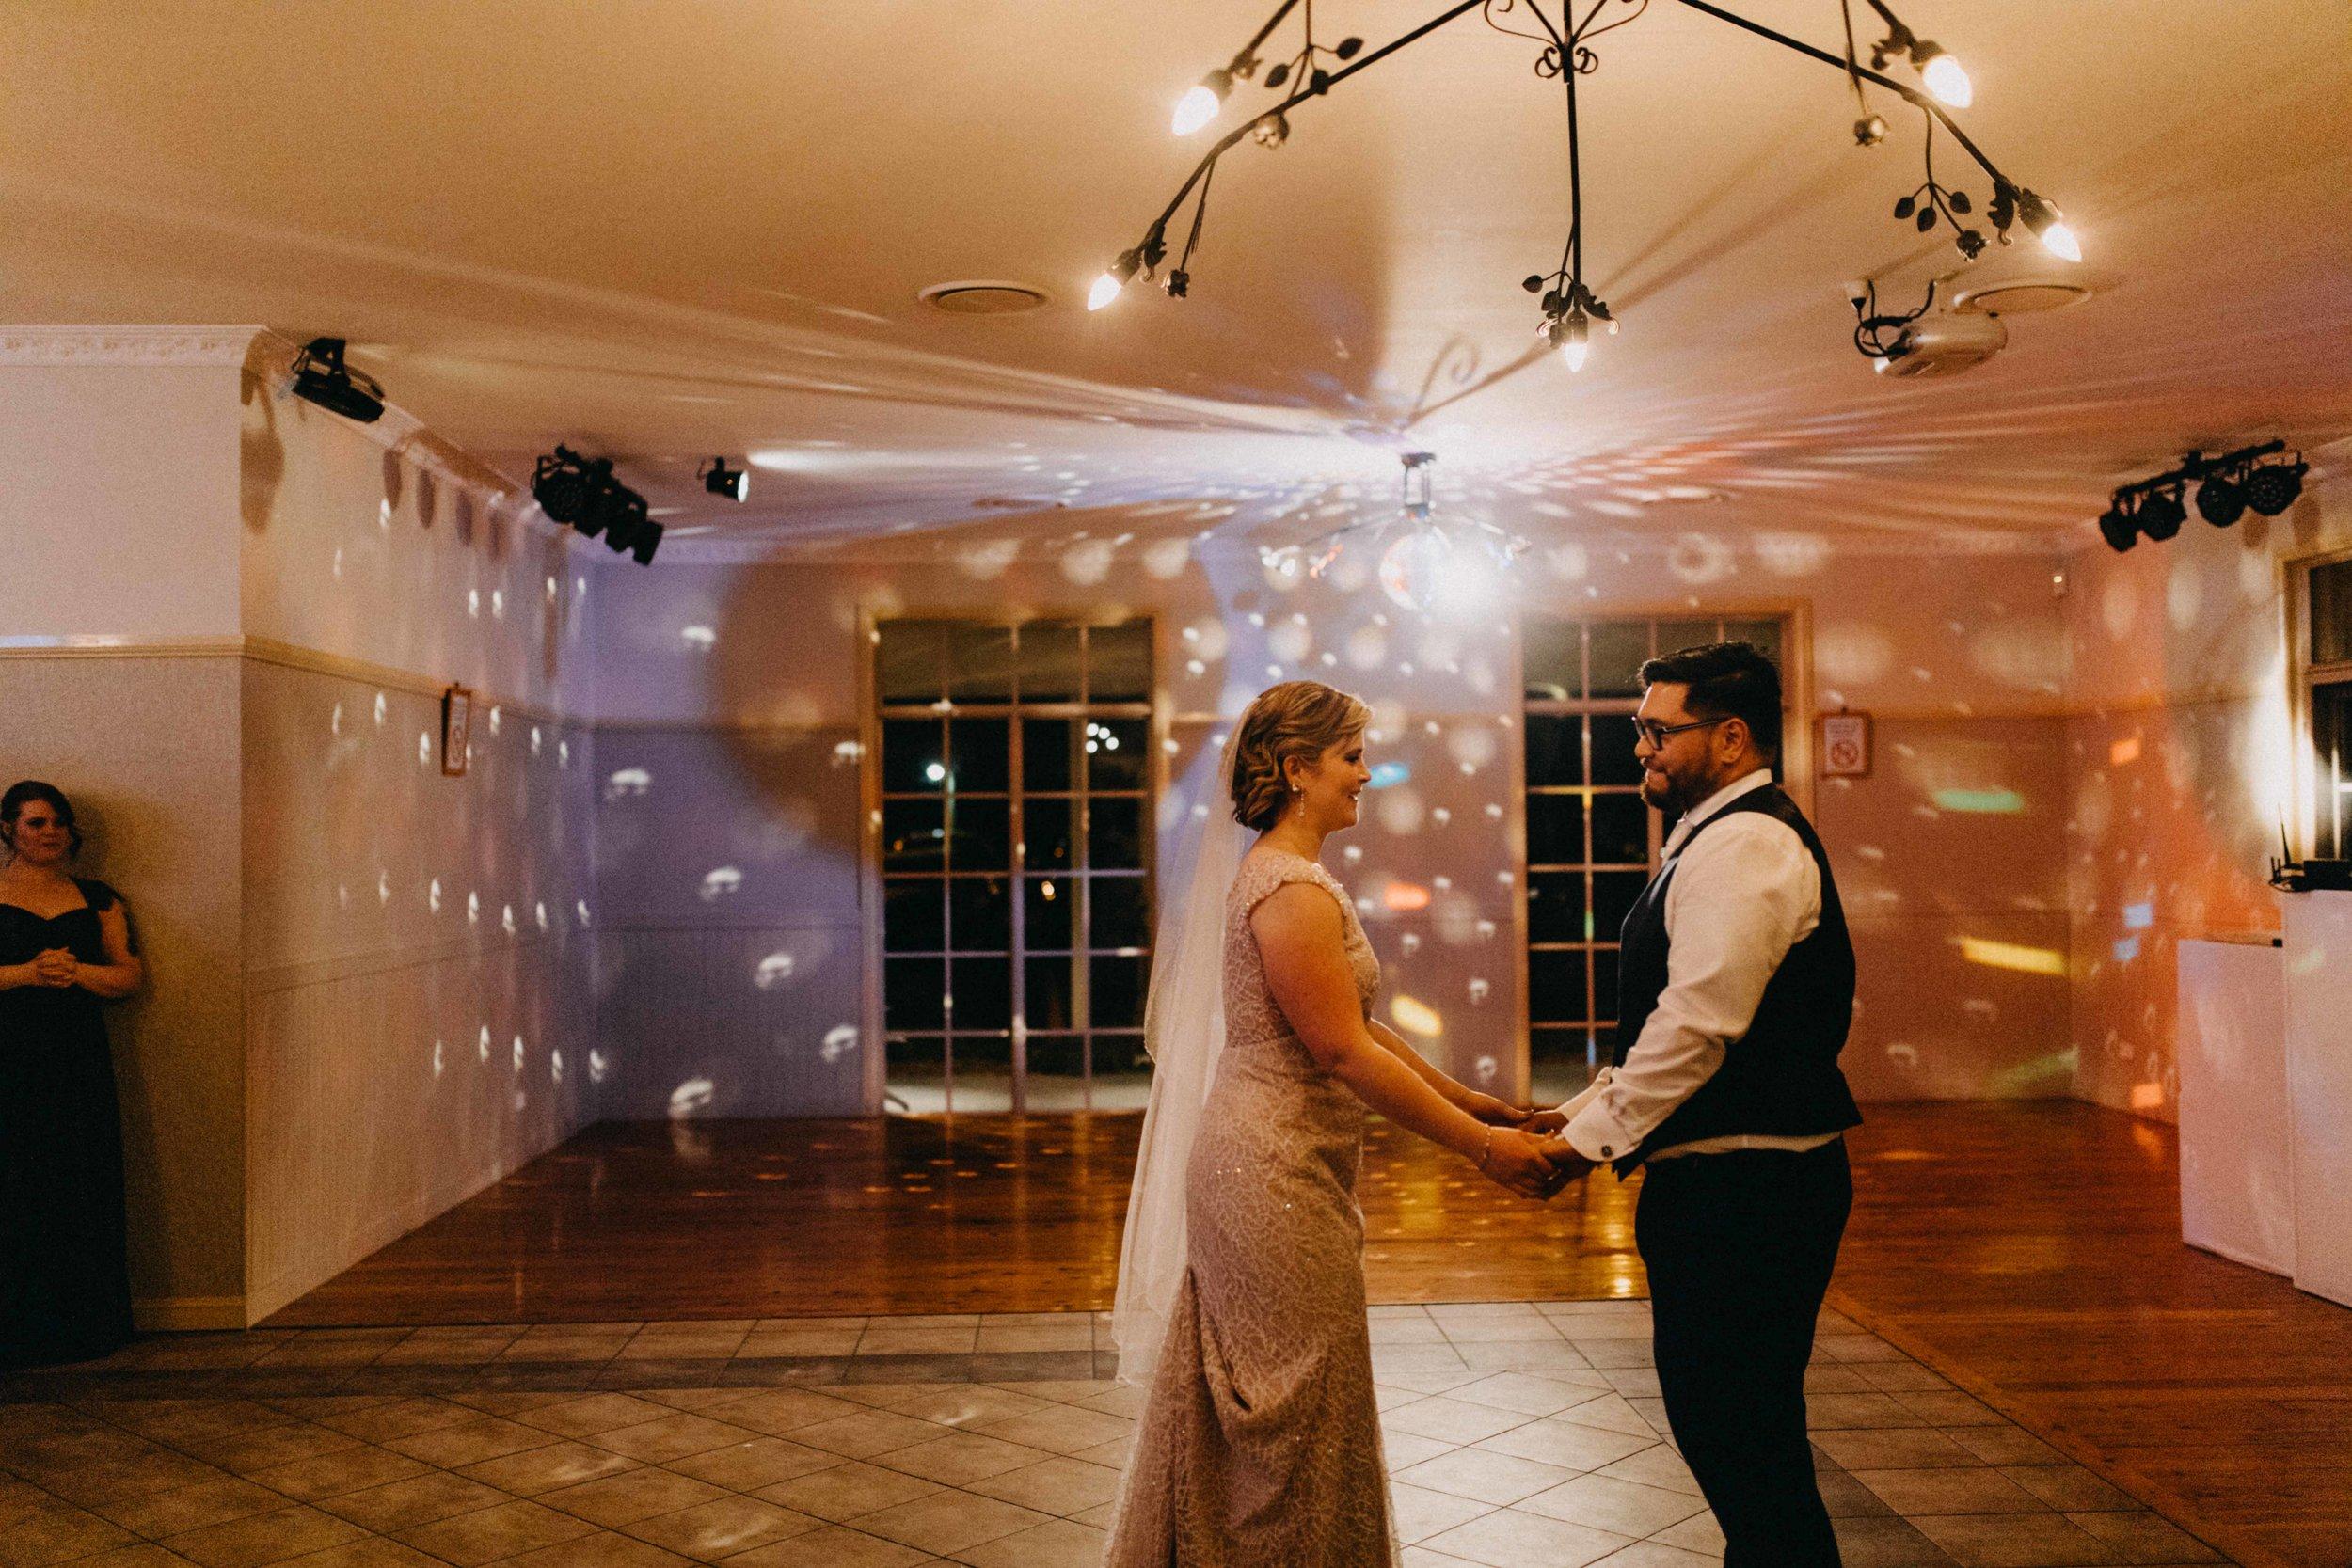 appin-house-wedding-macarthur-www.emilyobrienphotography.net-178.jpg